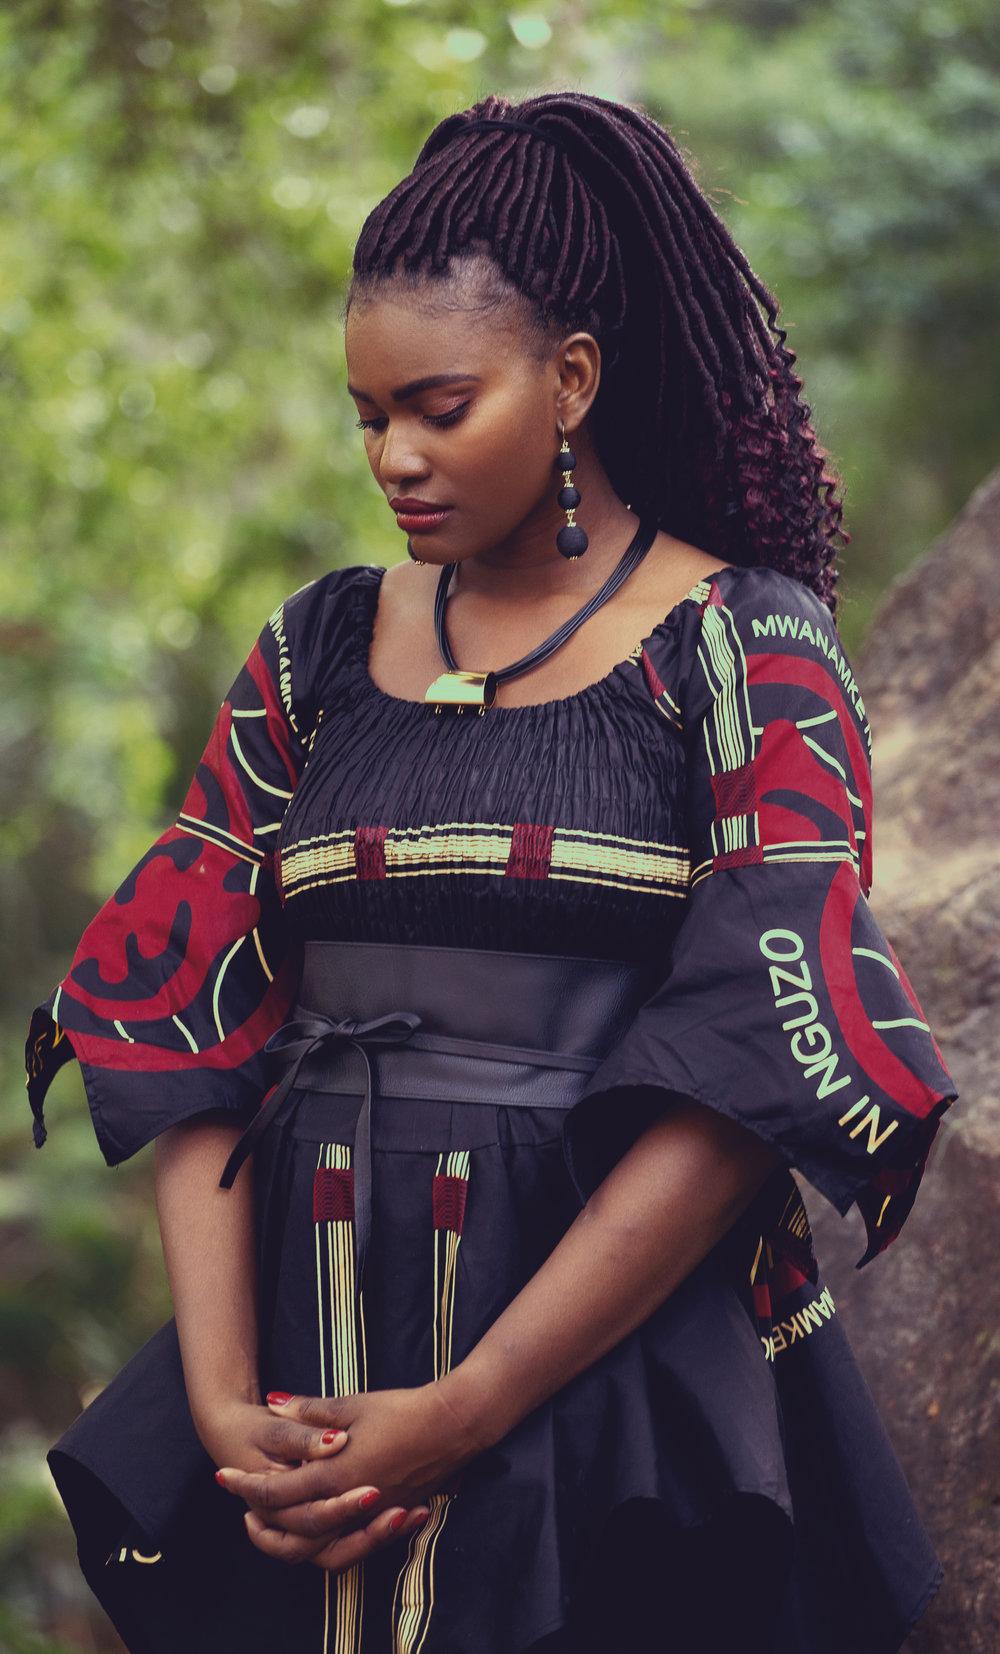 bridgette-african-nigerian-chamber-photography-photo-shoot7.jpg